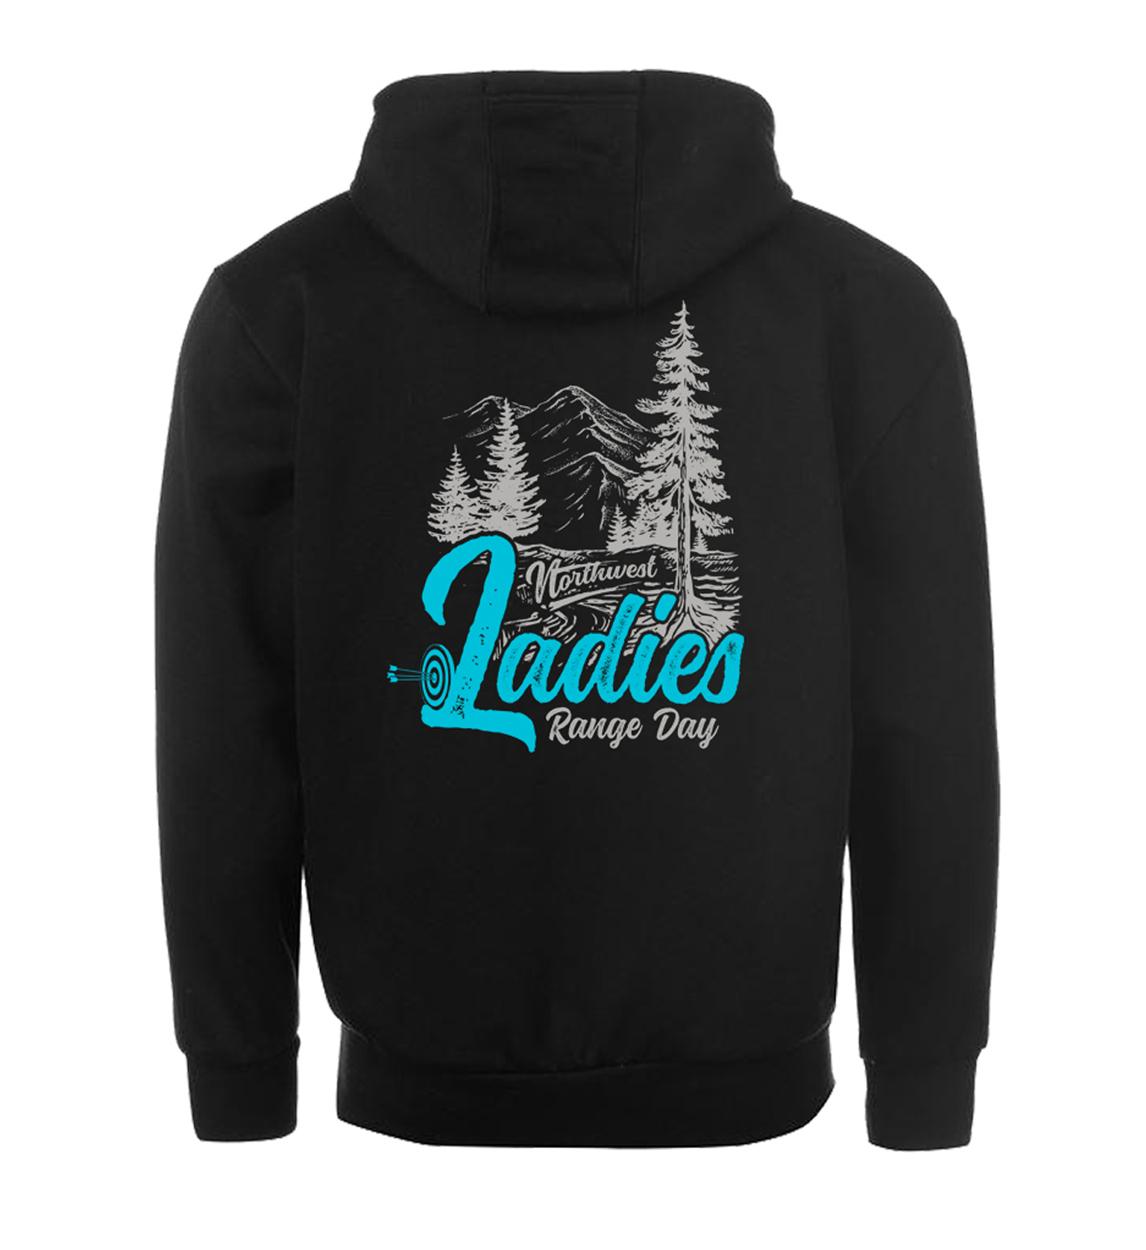 NW Ladies Range Day Archery Sweatshirt Desgin